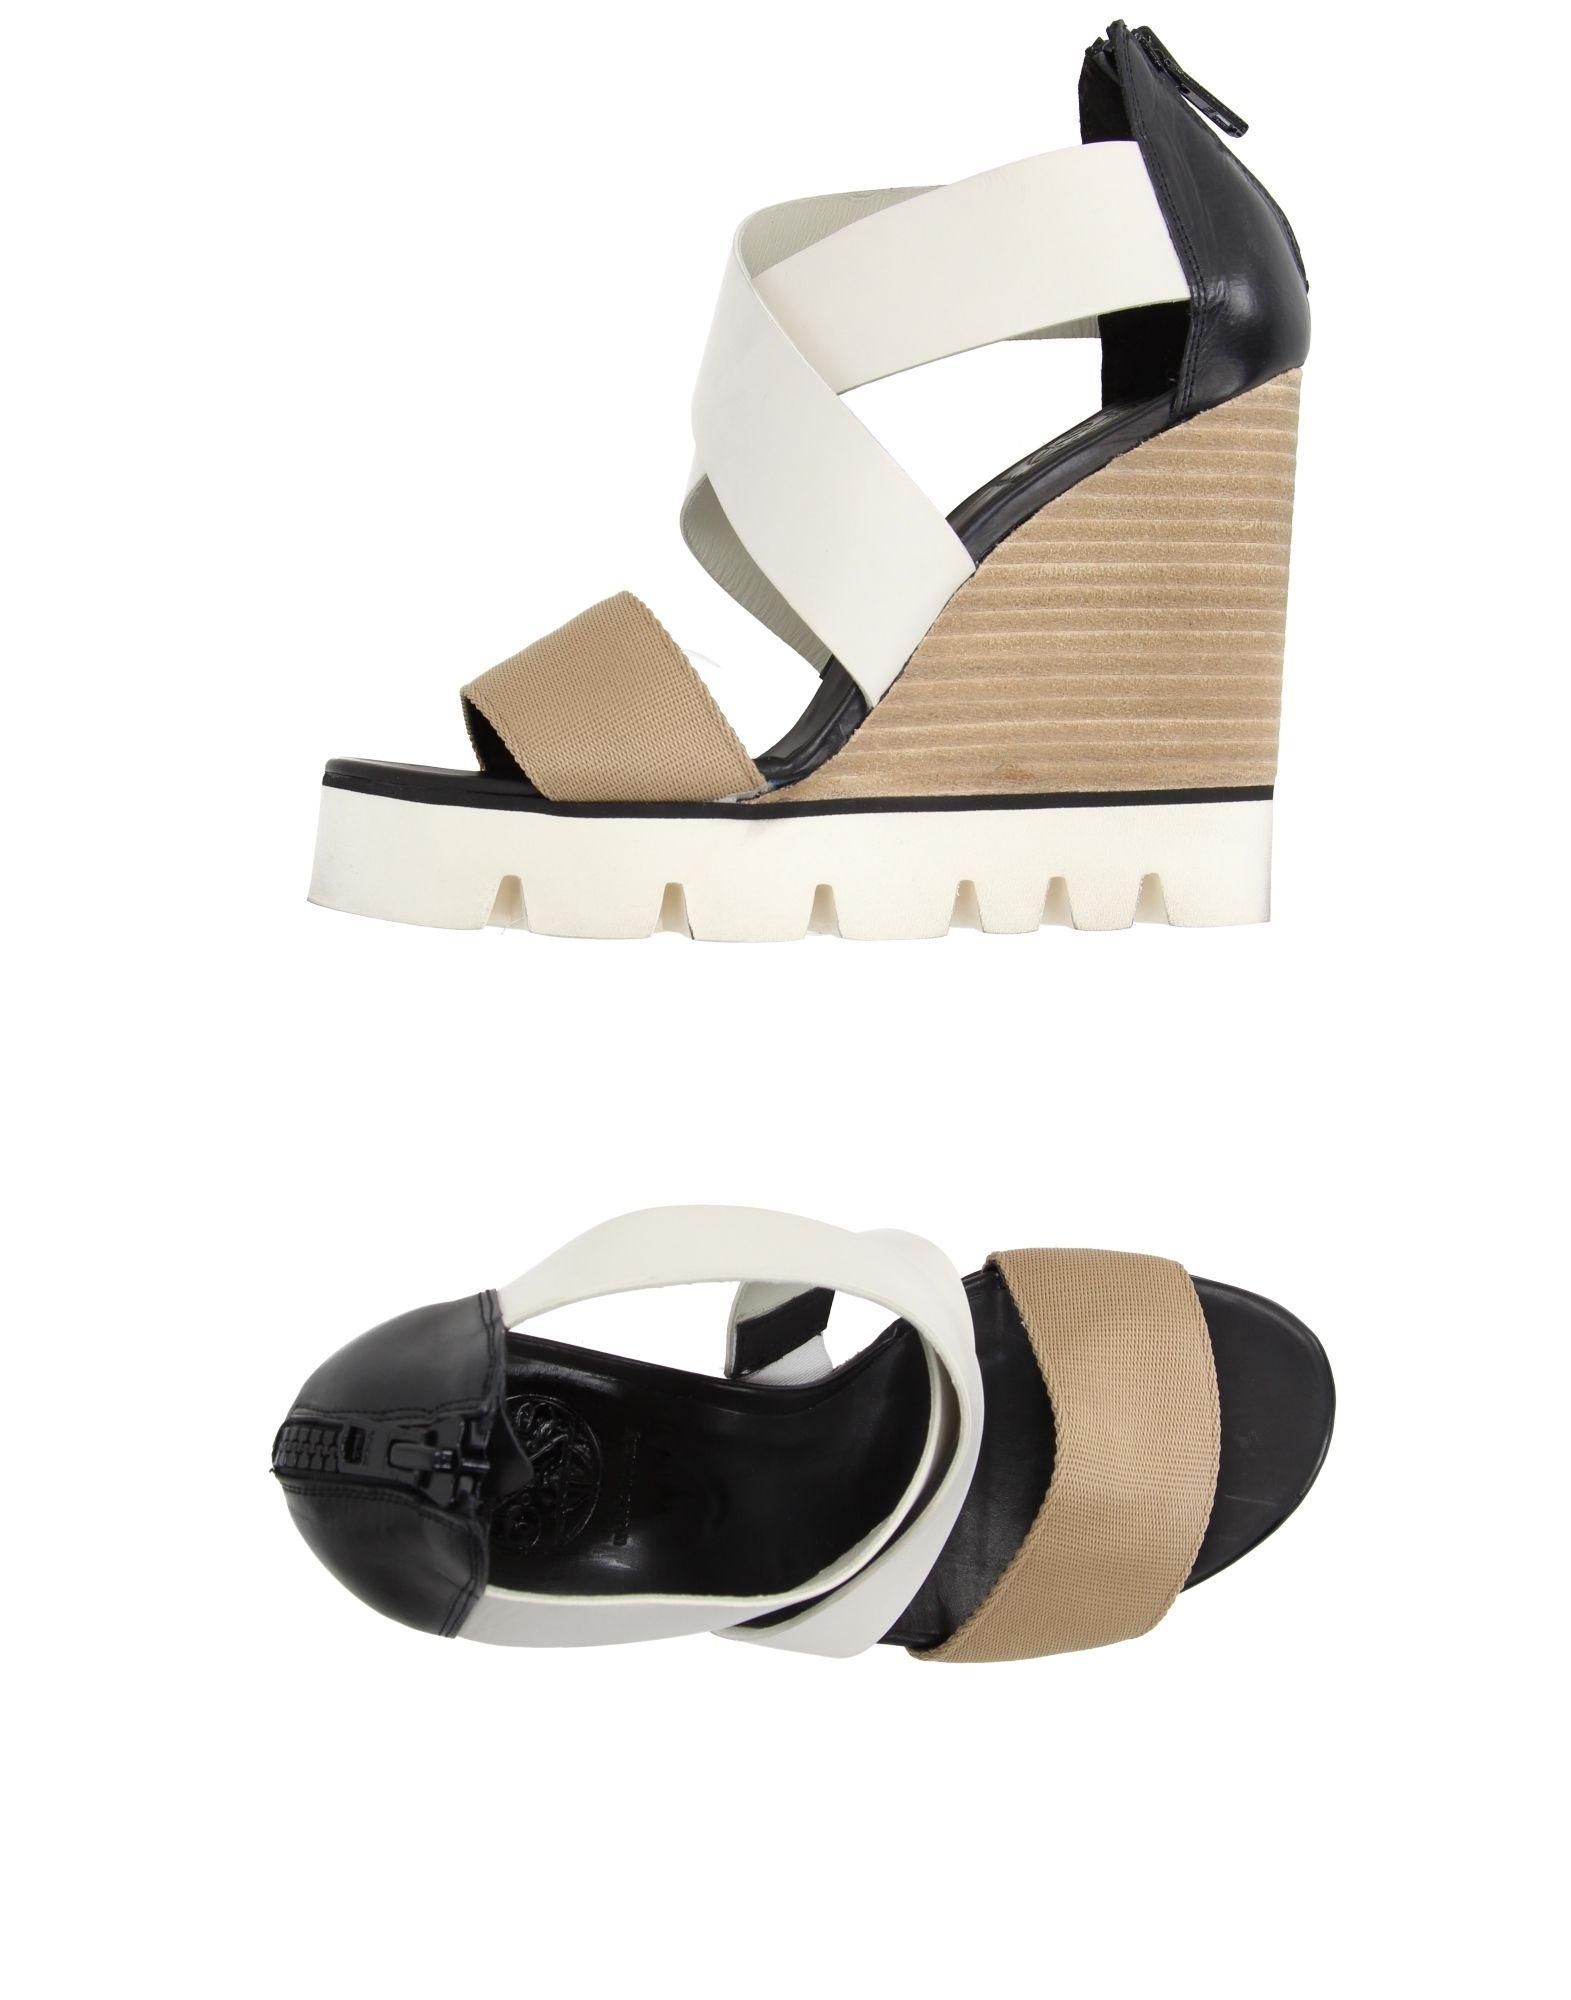 Zapatos casuales salvajes Sandalia O.X.S.  Mujer - Sandalias O.X.S.  O.X.S. Beige 9de8ee